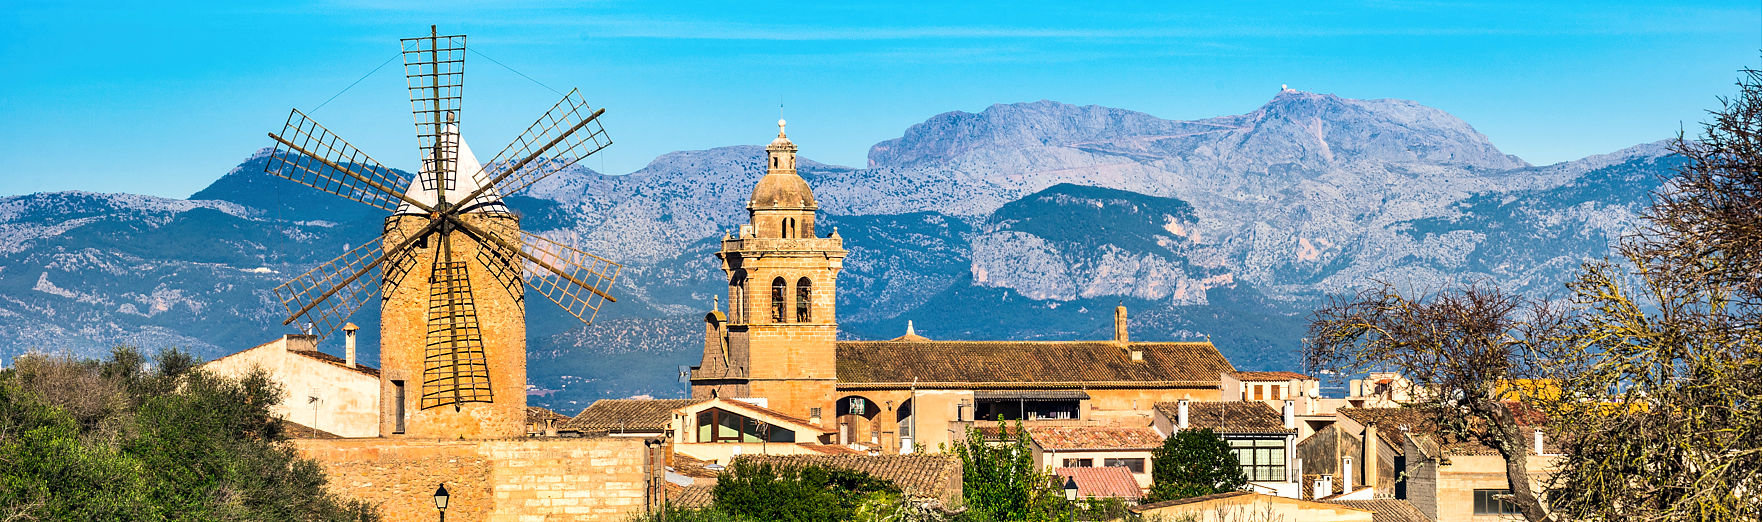 Mallorca Algaida